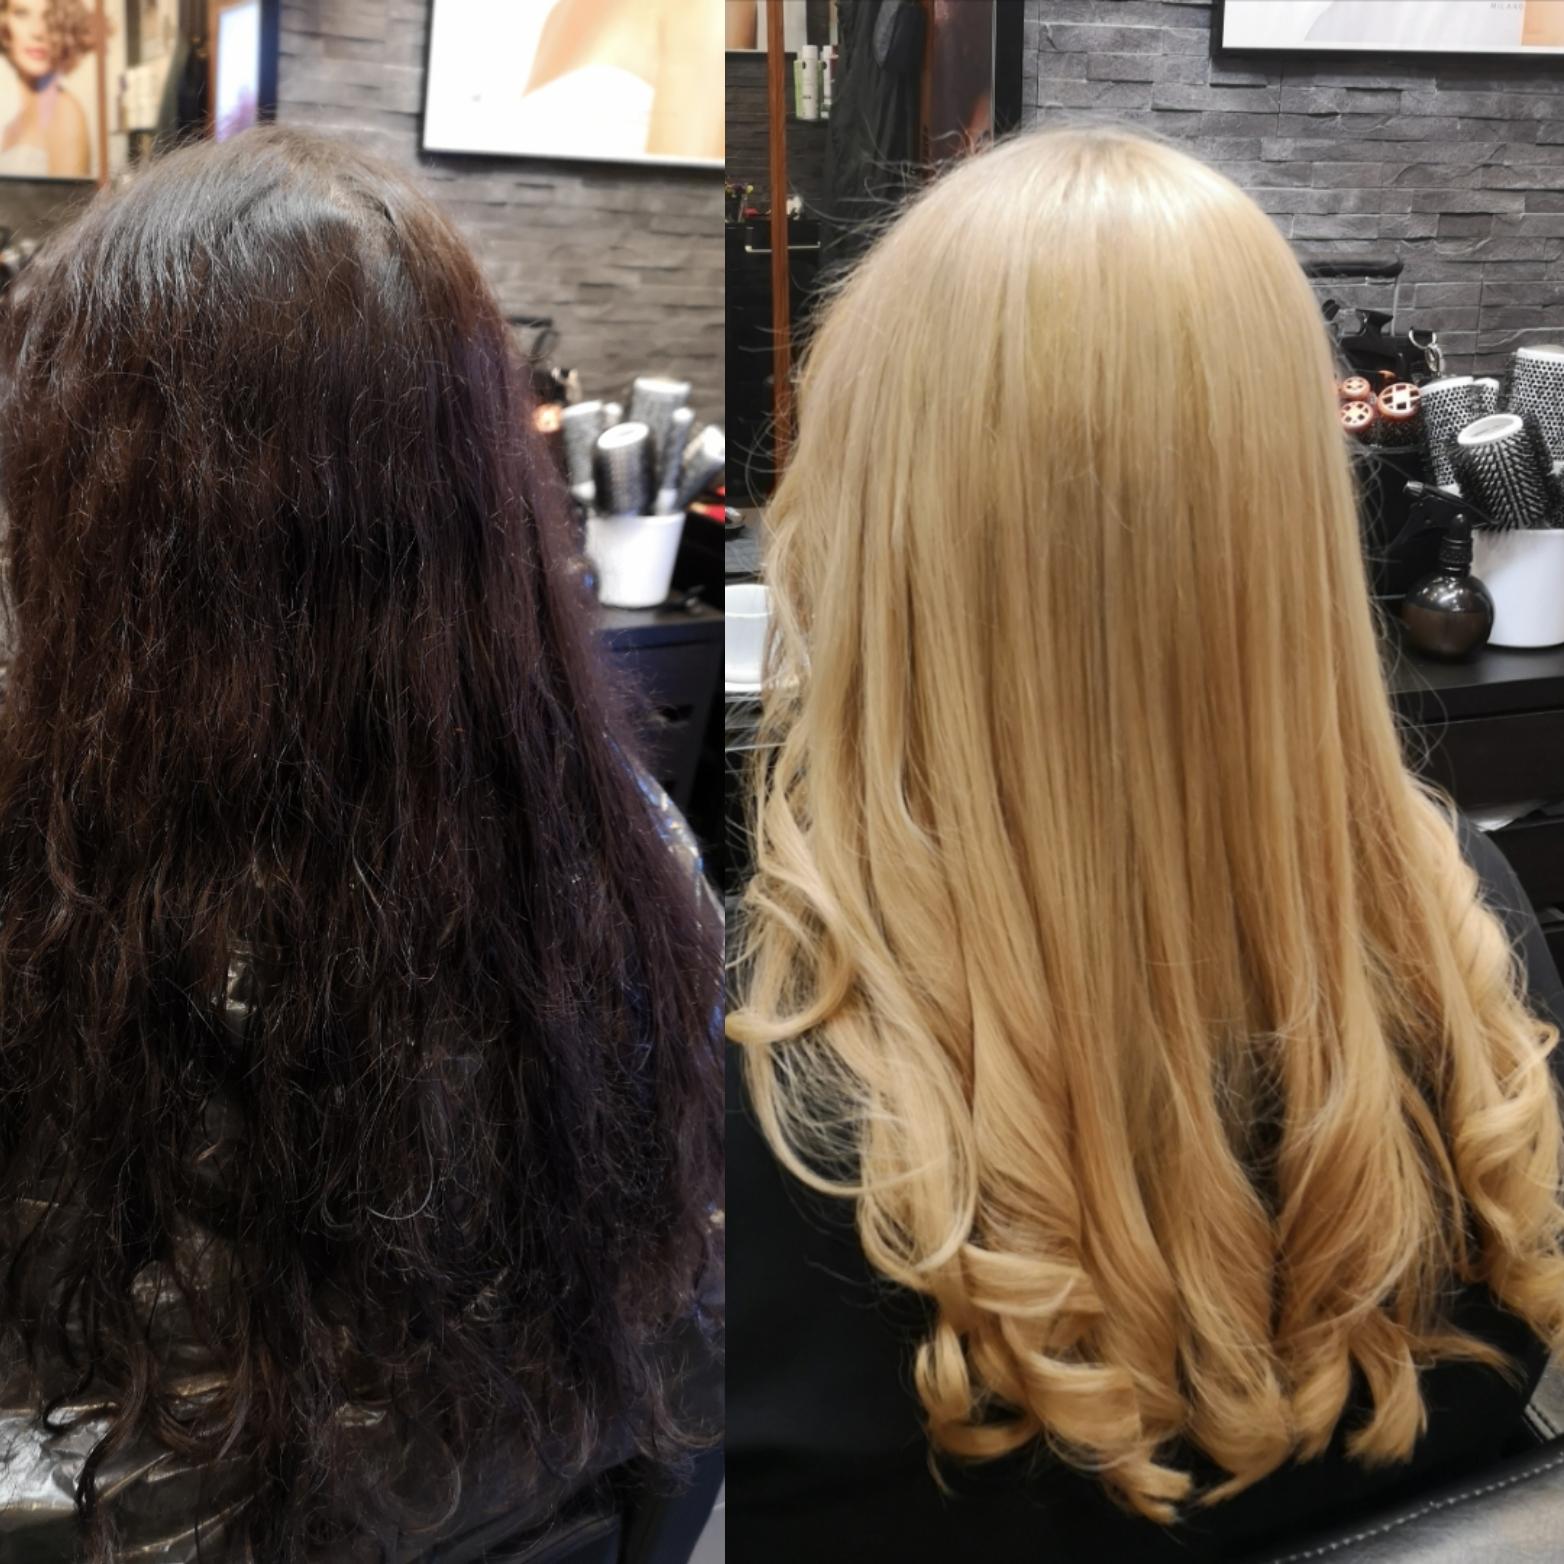 niloufar coiffeuse .transformation